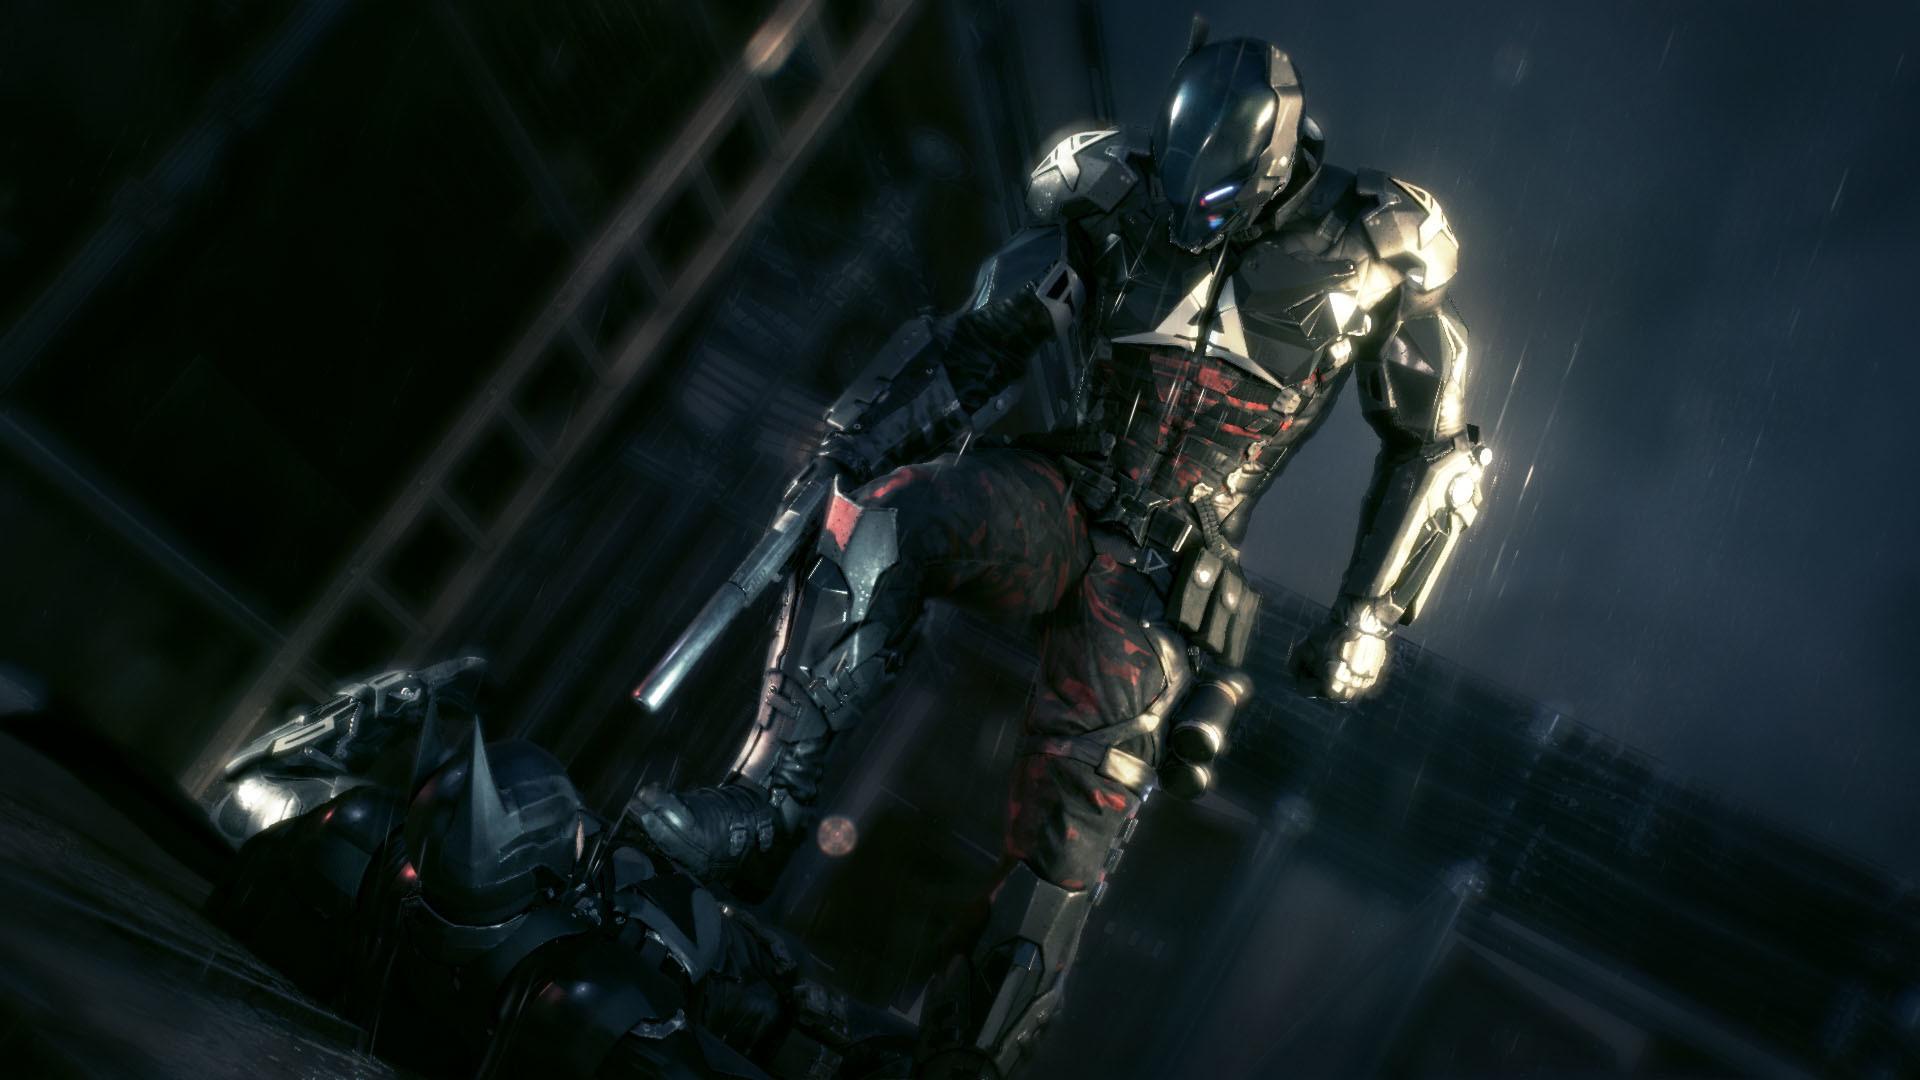 Batman Arkham Knight – The Arkham Knight beating up Batman  wallpaper